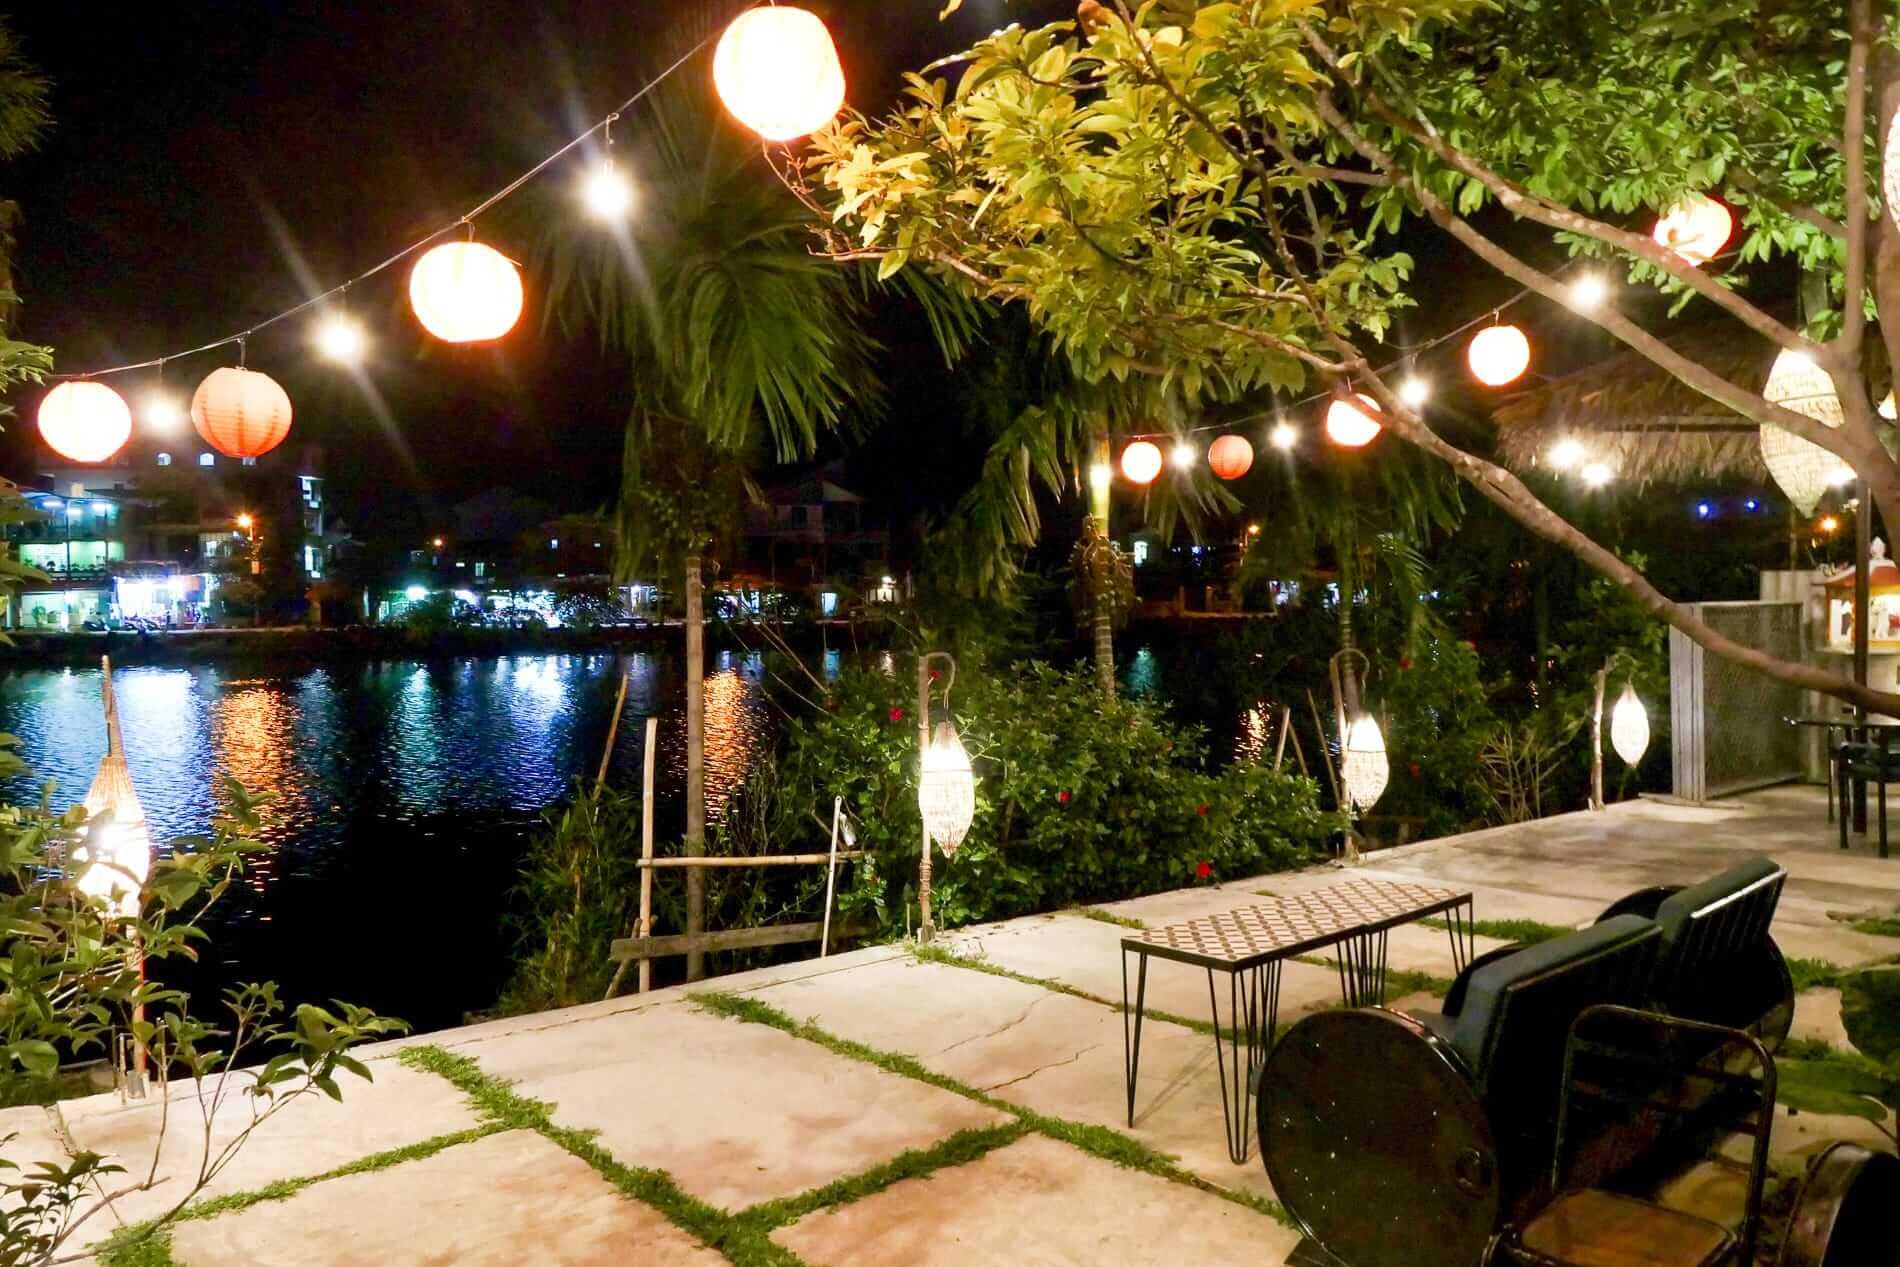 A wonderful night view from Hue Riverside Villa